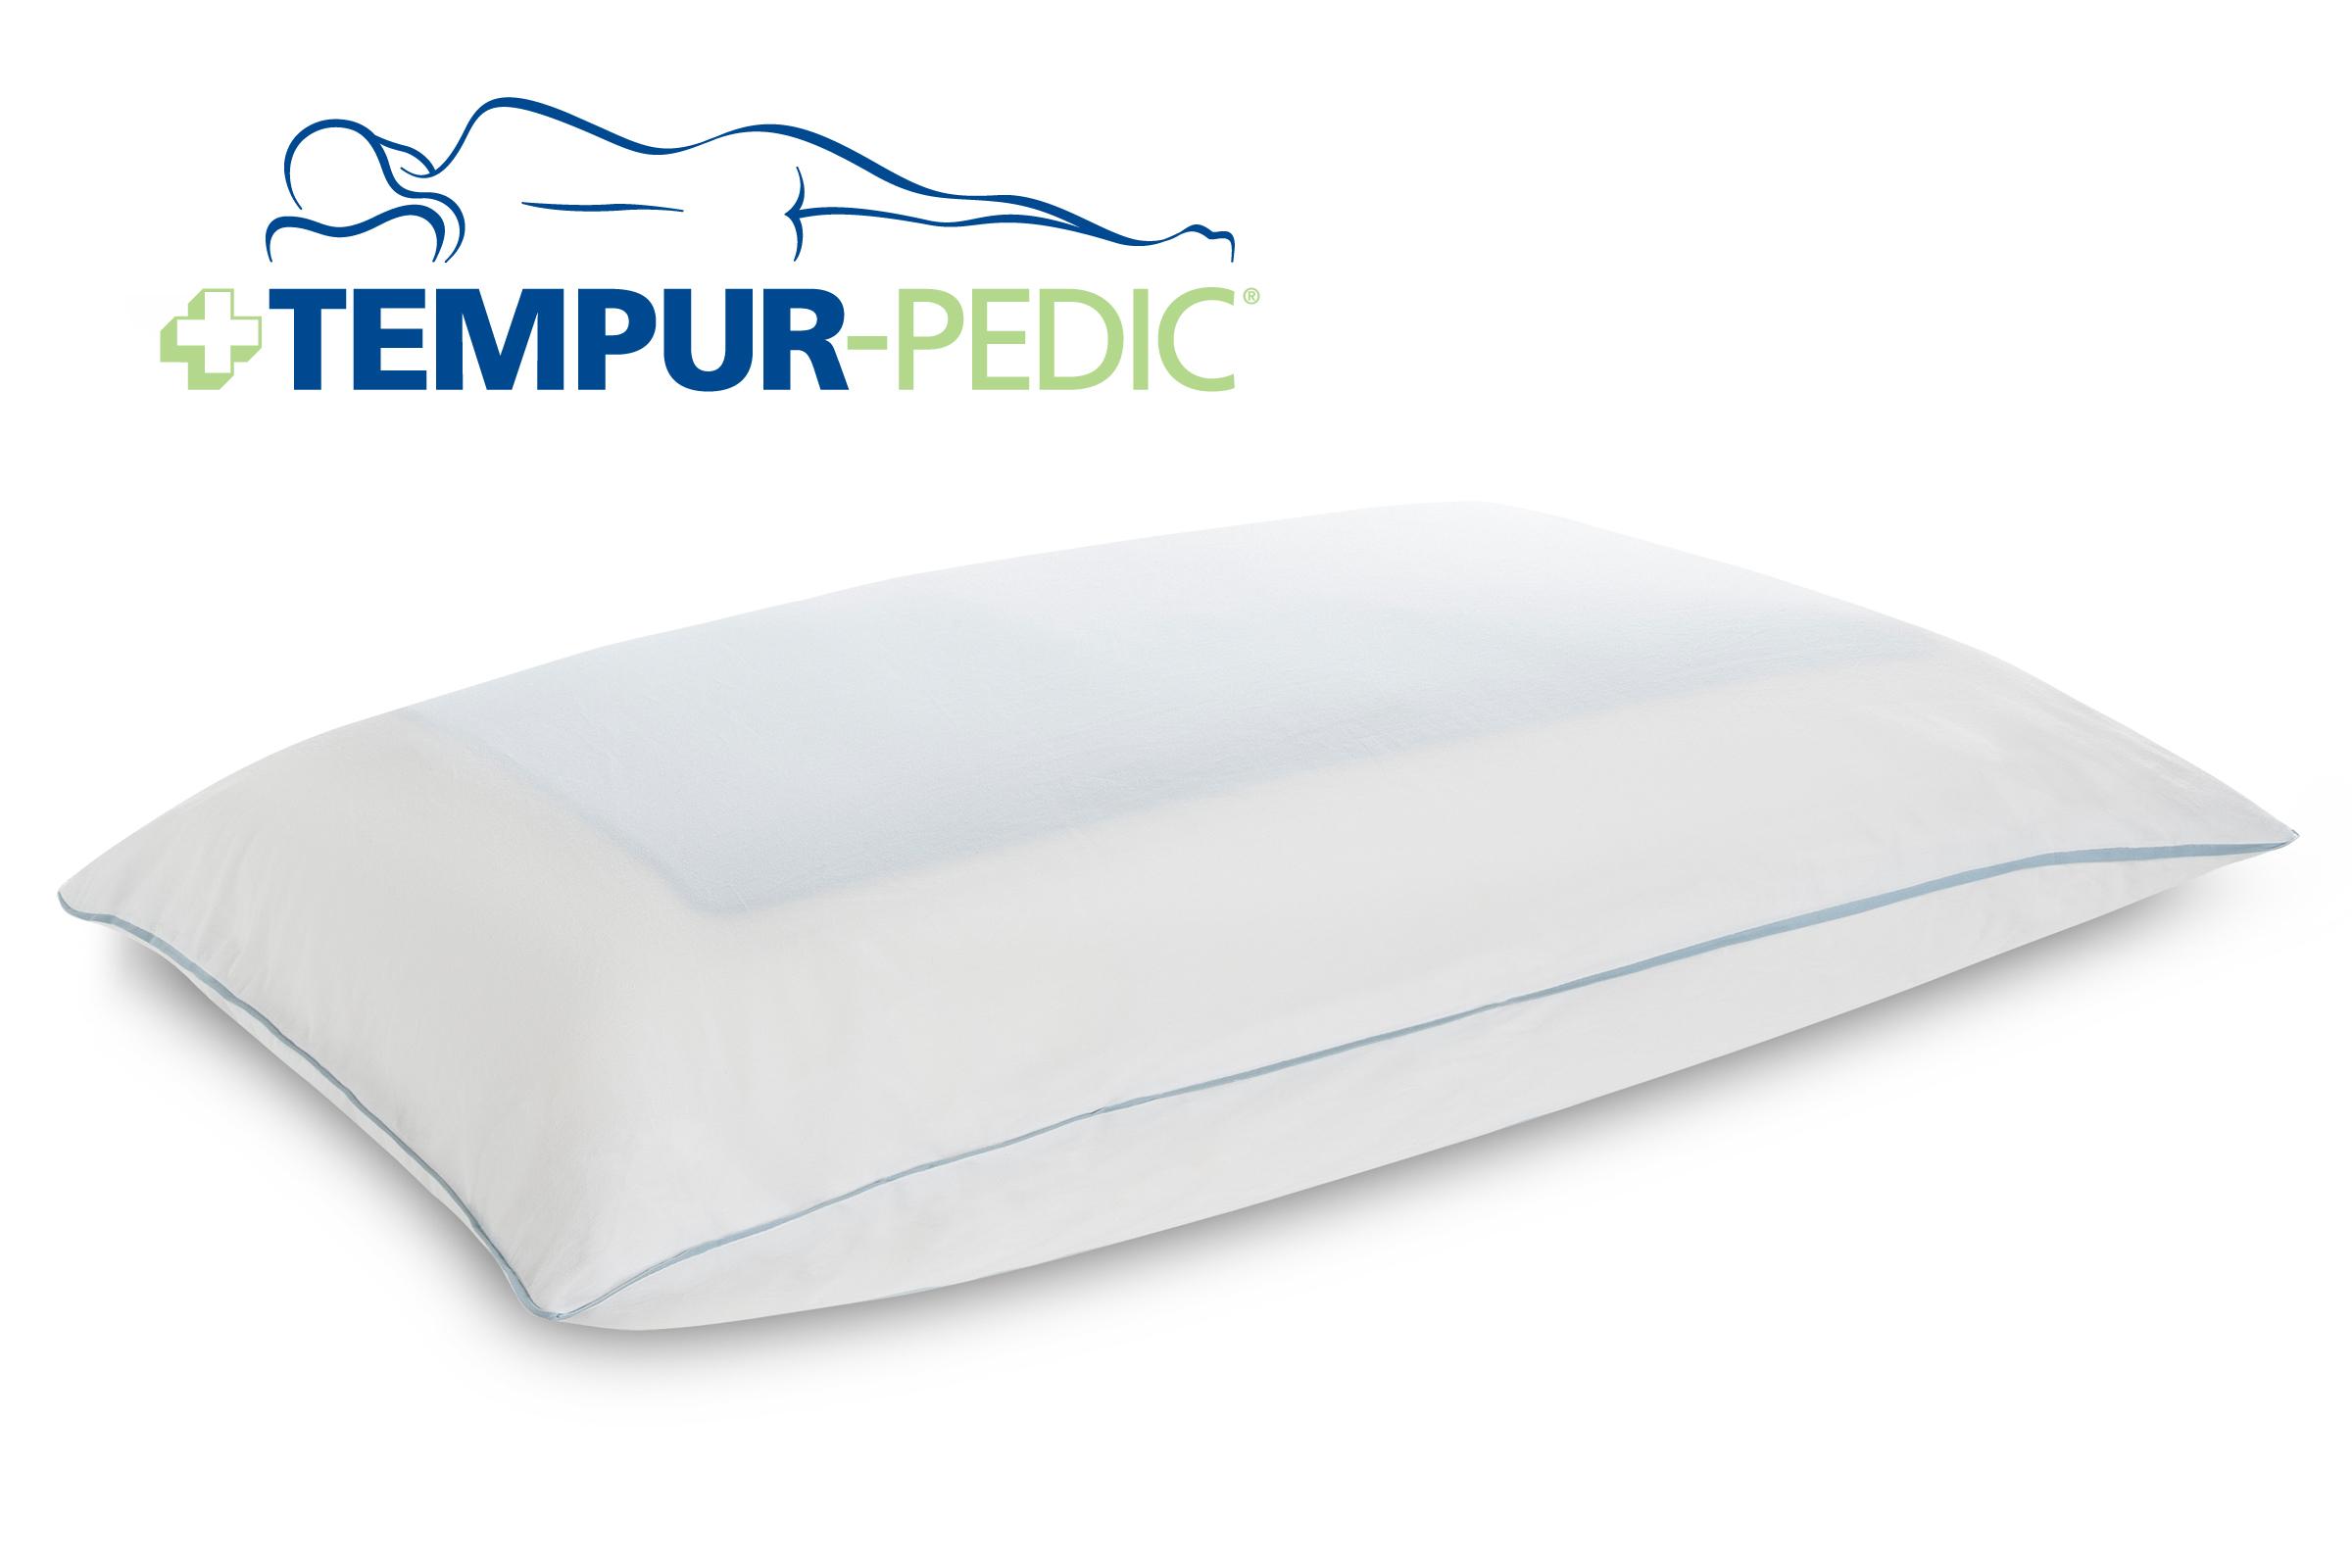 tempurcloud breeze dual cooling pillow - Tempurpedic Cloud